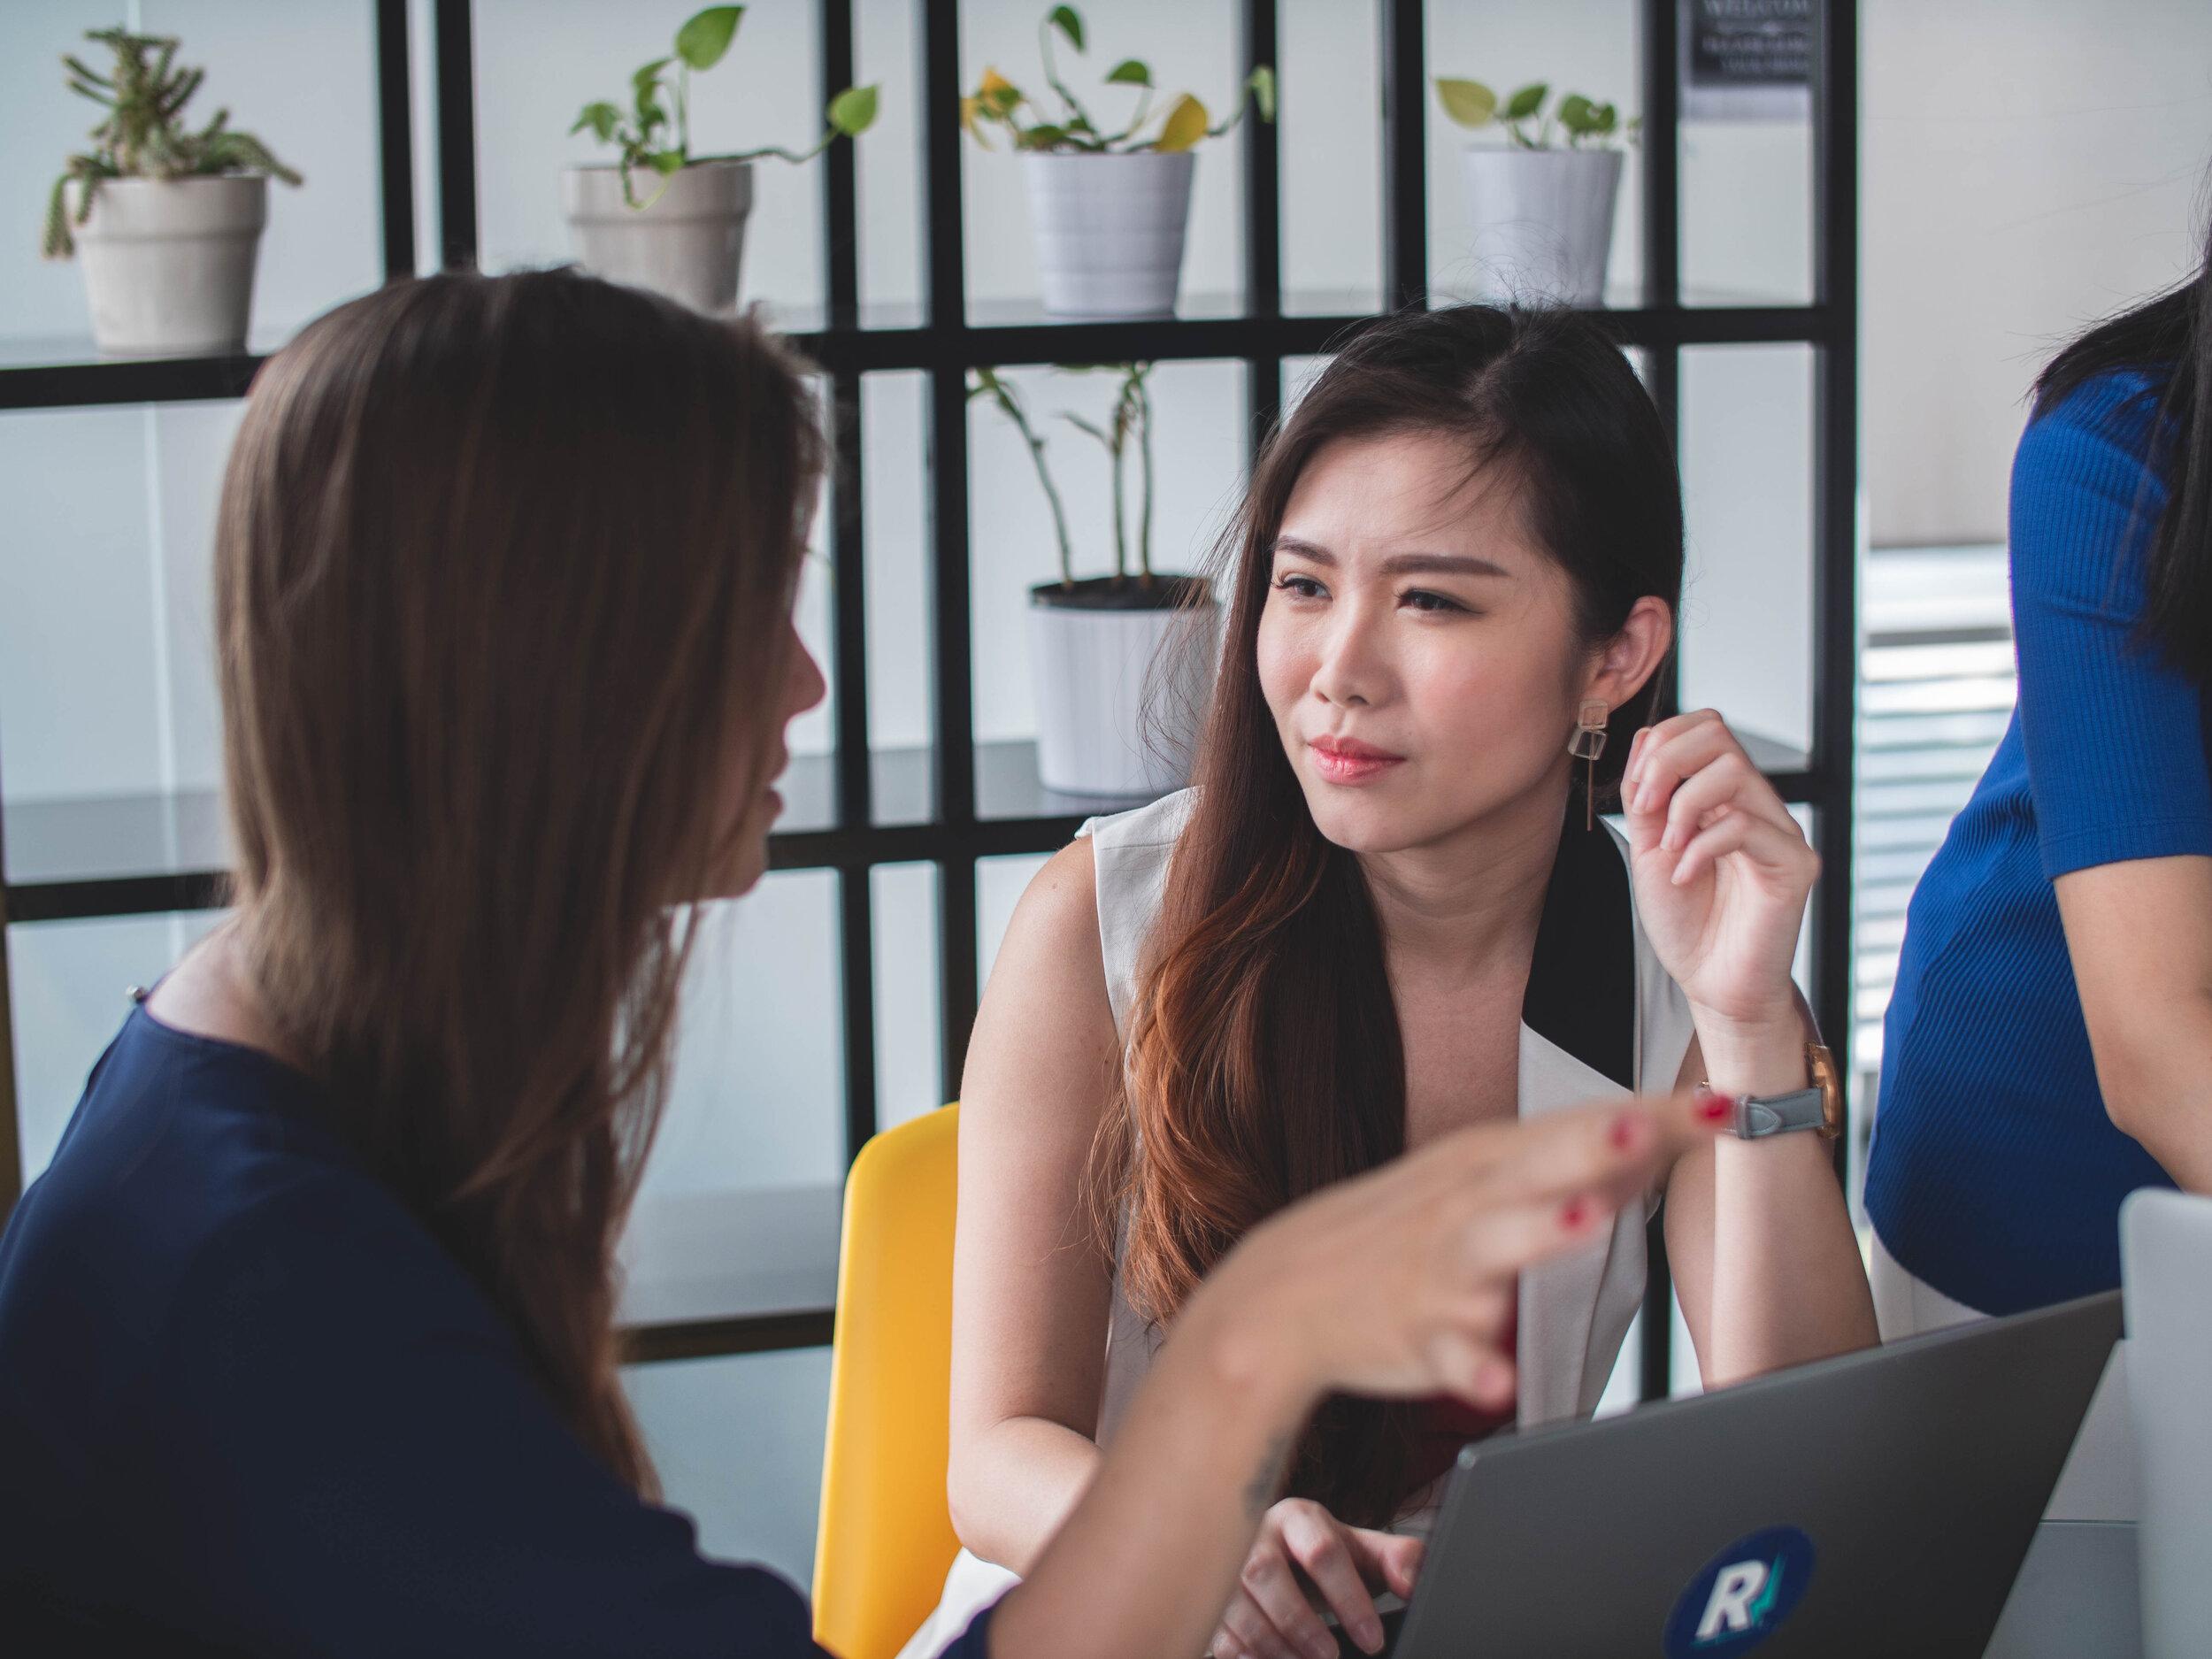 How to Build Trust: Four-Part Leader Communication Formula